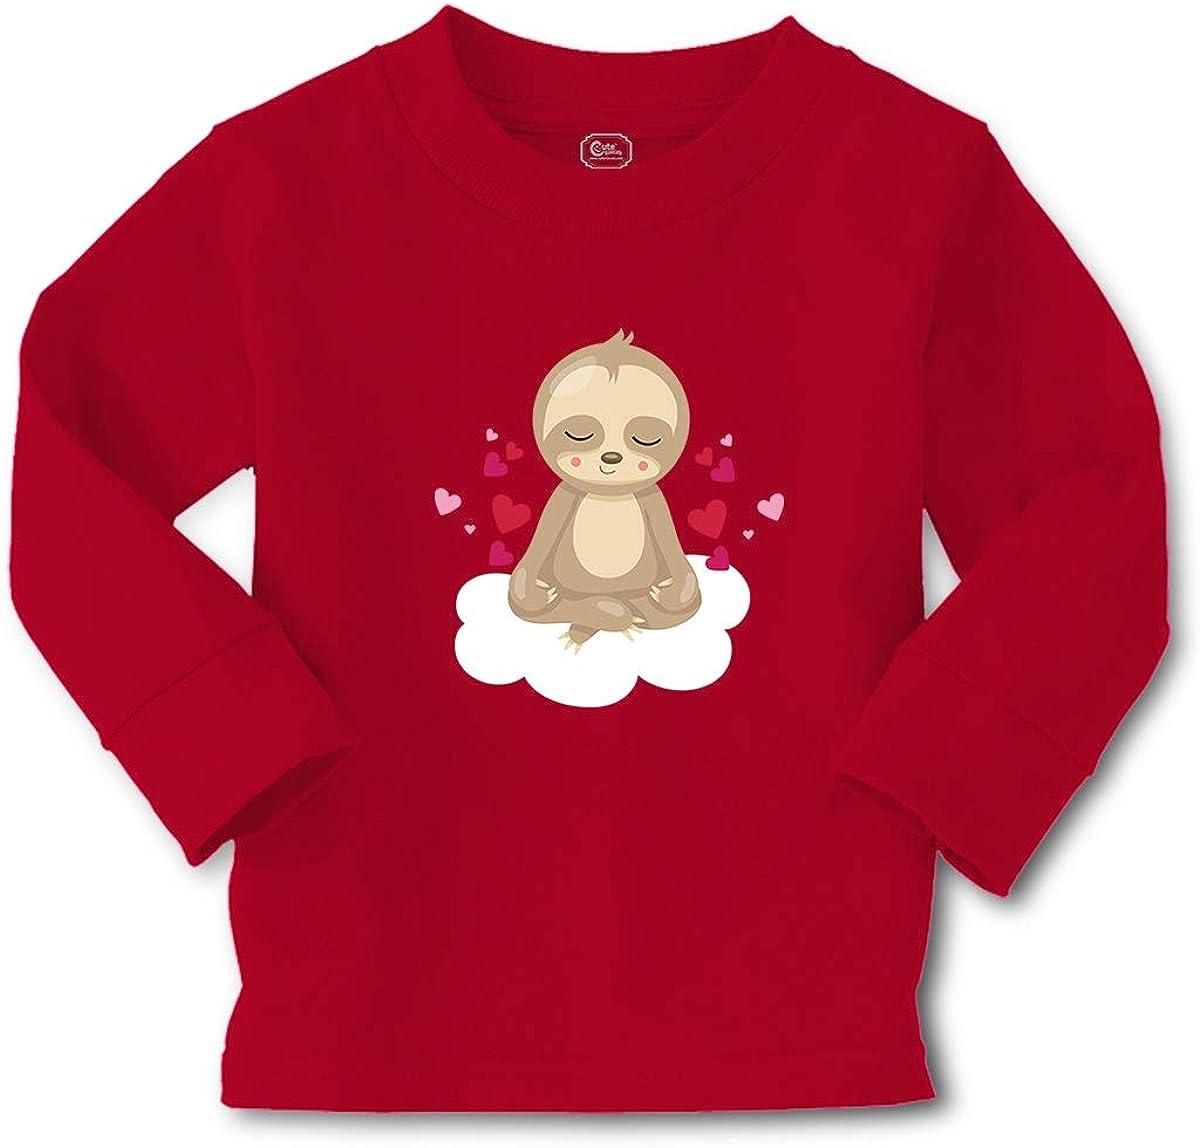 Cute Rascals Kids Long Sleeve T Shirt Valentine Sloth Hearts Cotton Boy & Girl Clothes